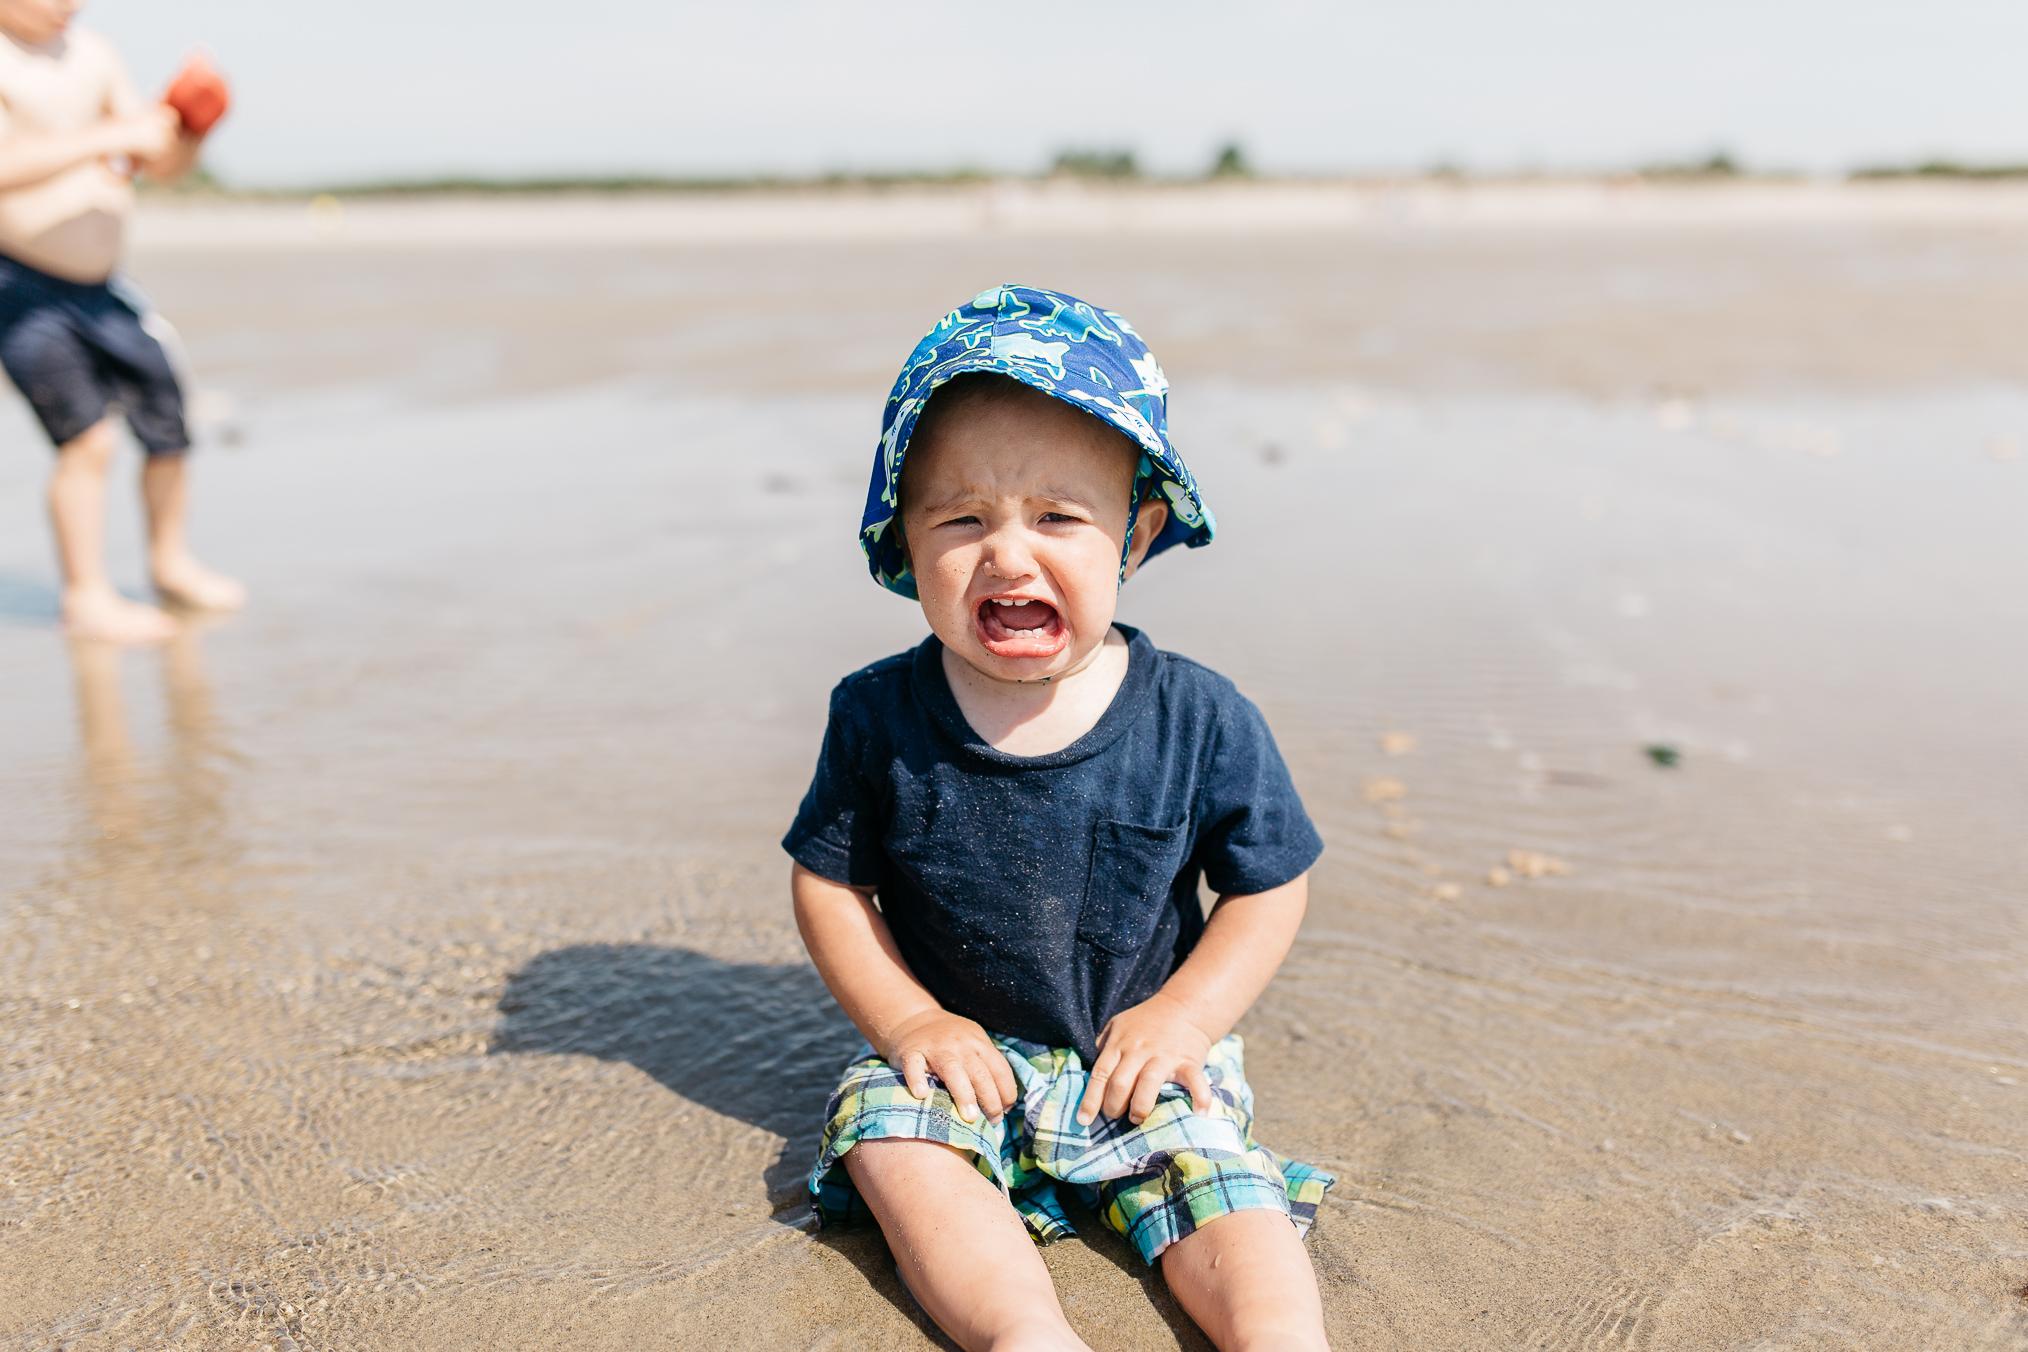 maine-photographer-family-children-lifestyle-documentary-beach-photography-11.jpg